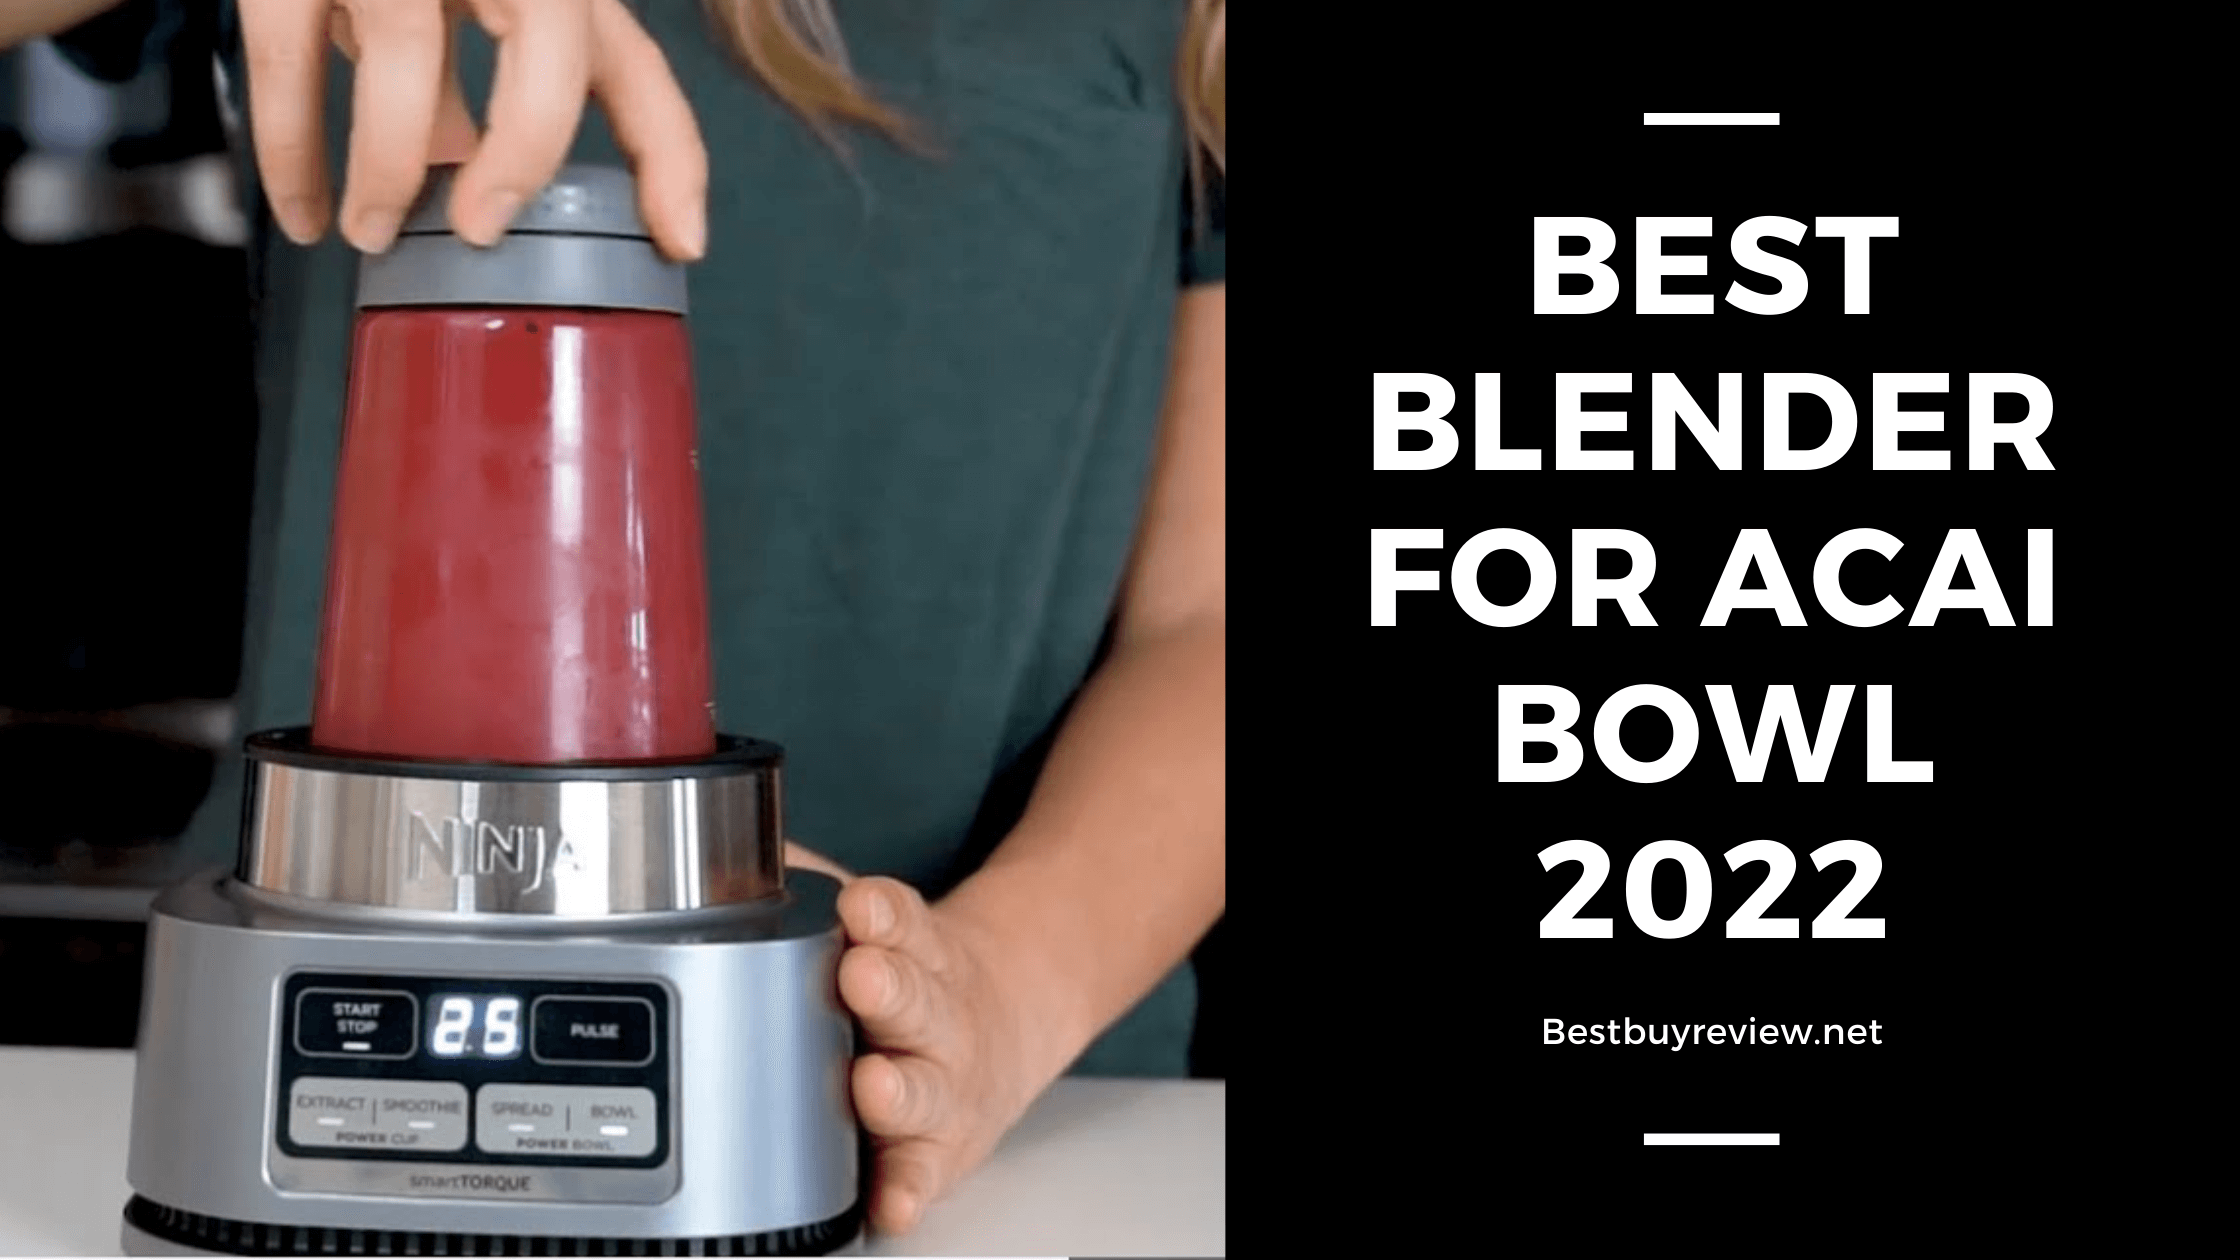 Best Blender for Acai Bowl 2022